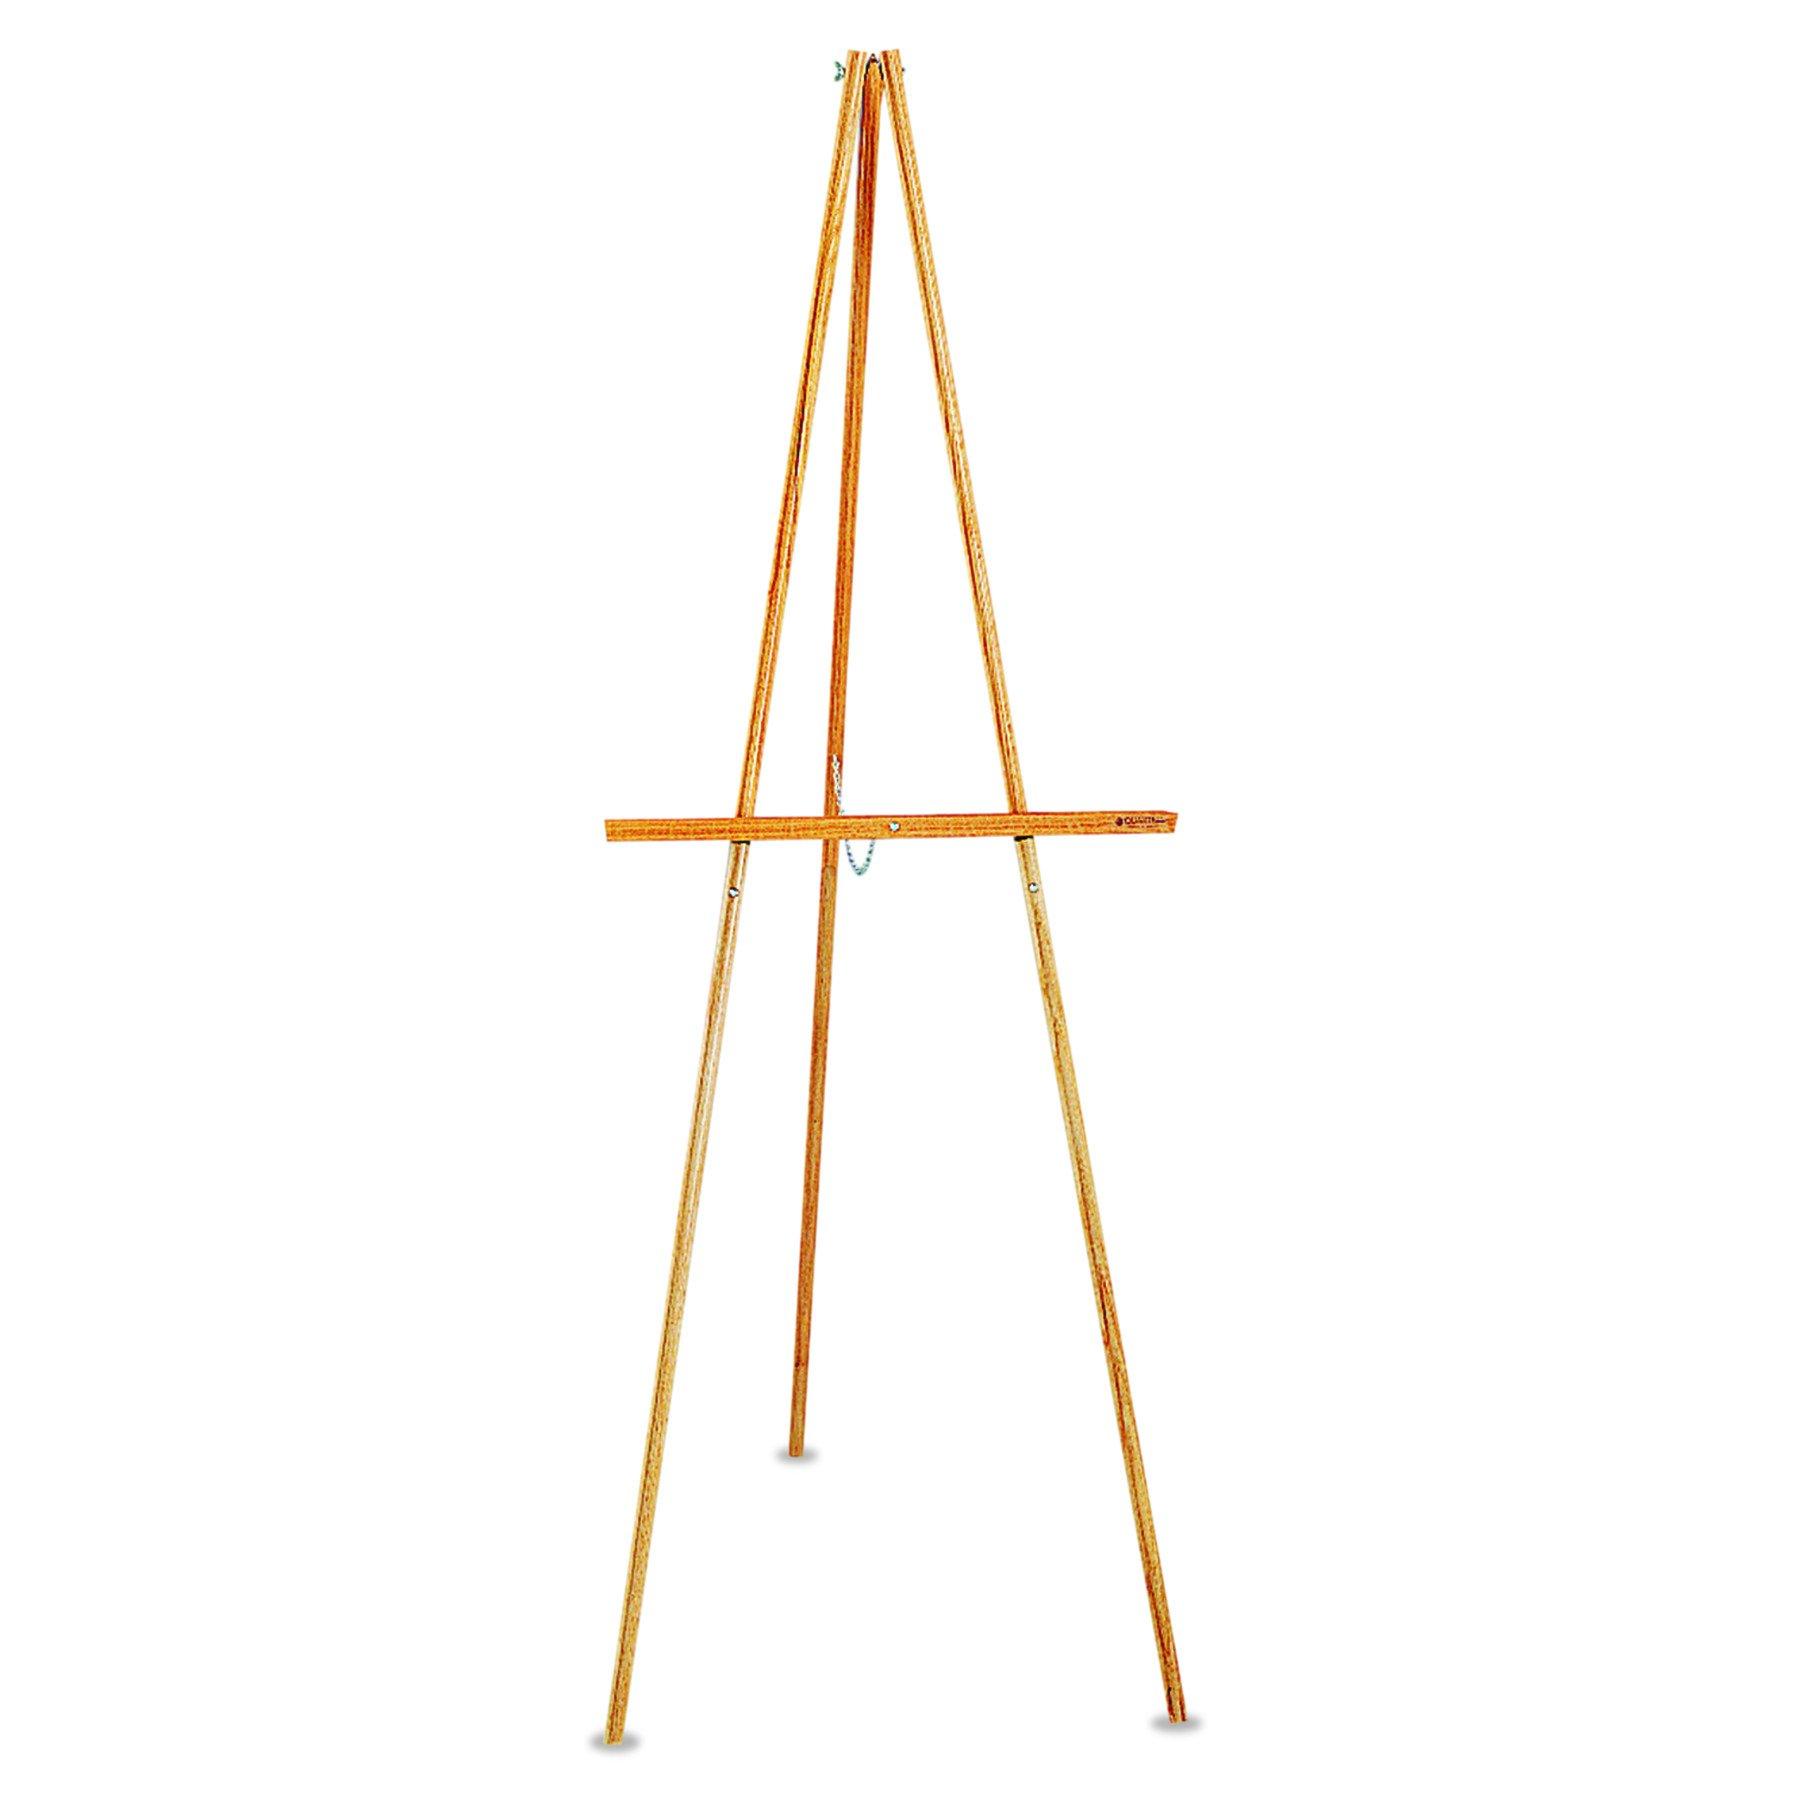 Quartet Lightweight Wood Display Easel, Natural Oak (41E) by Quartet